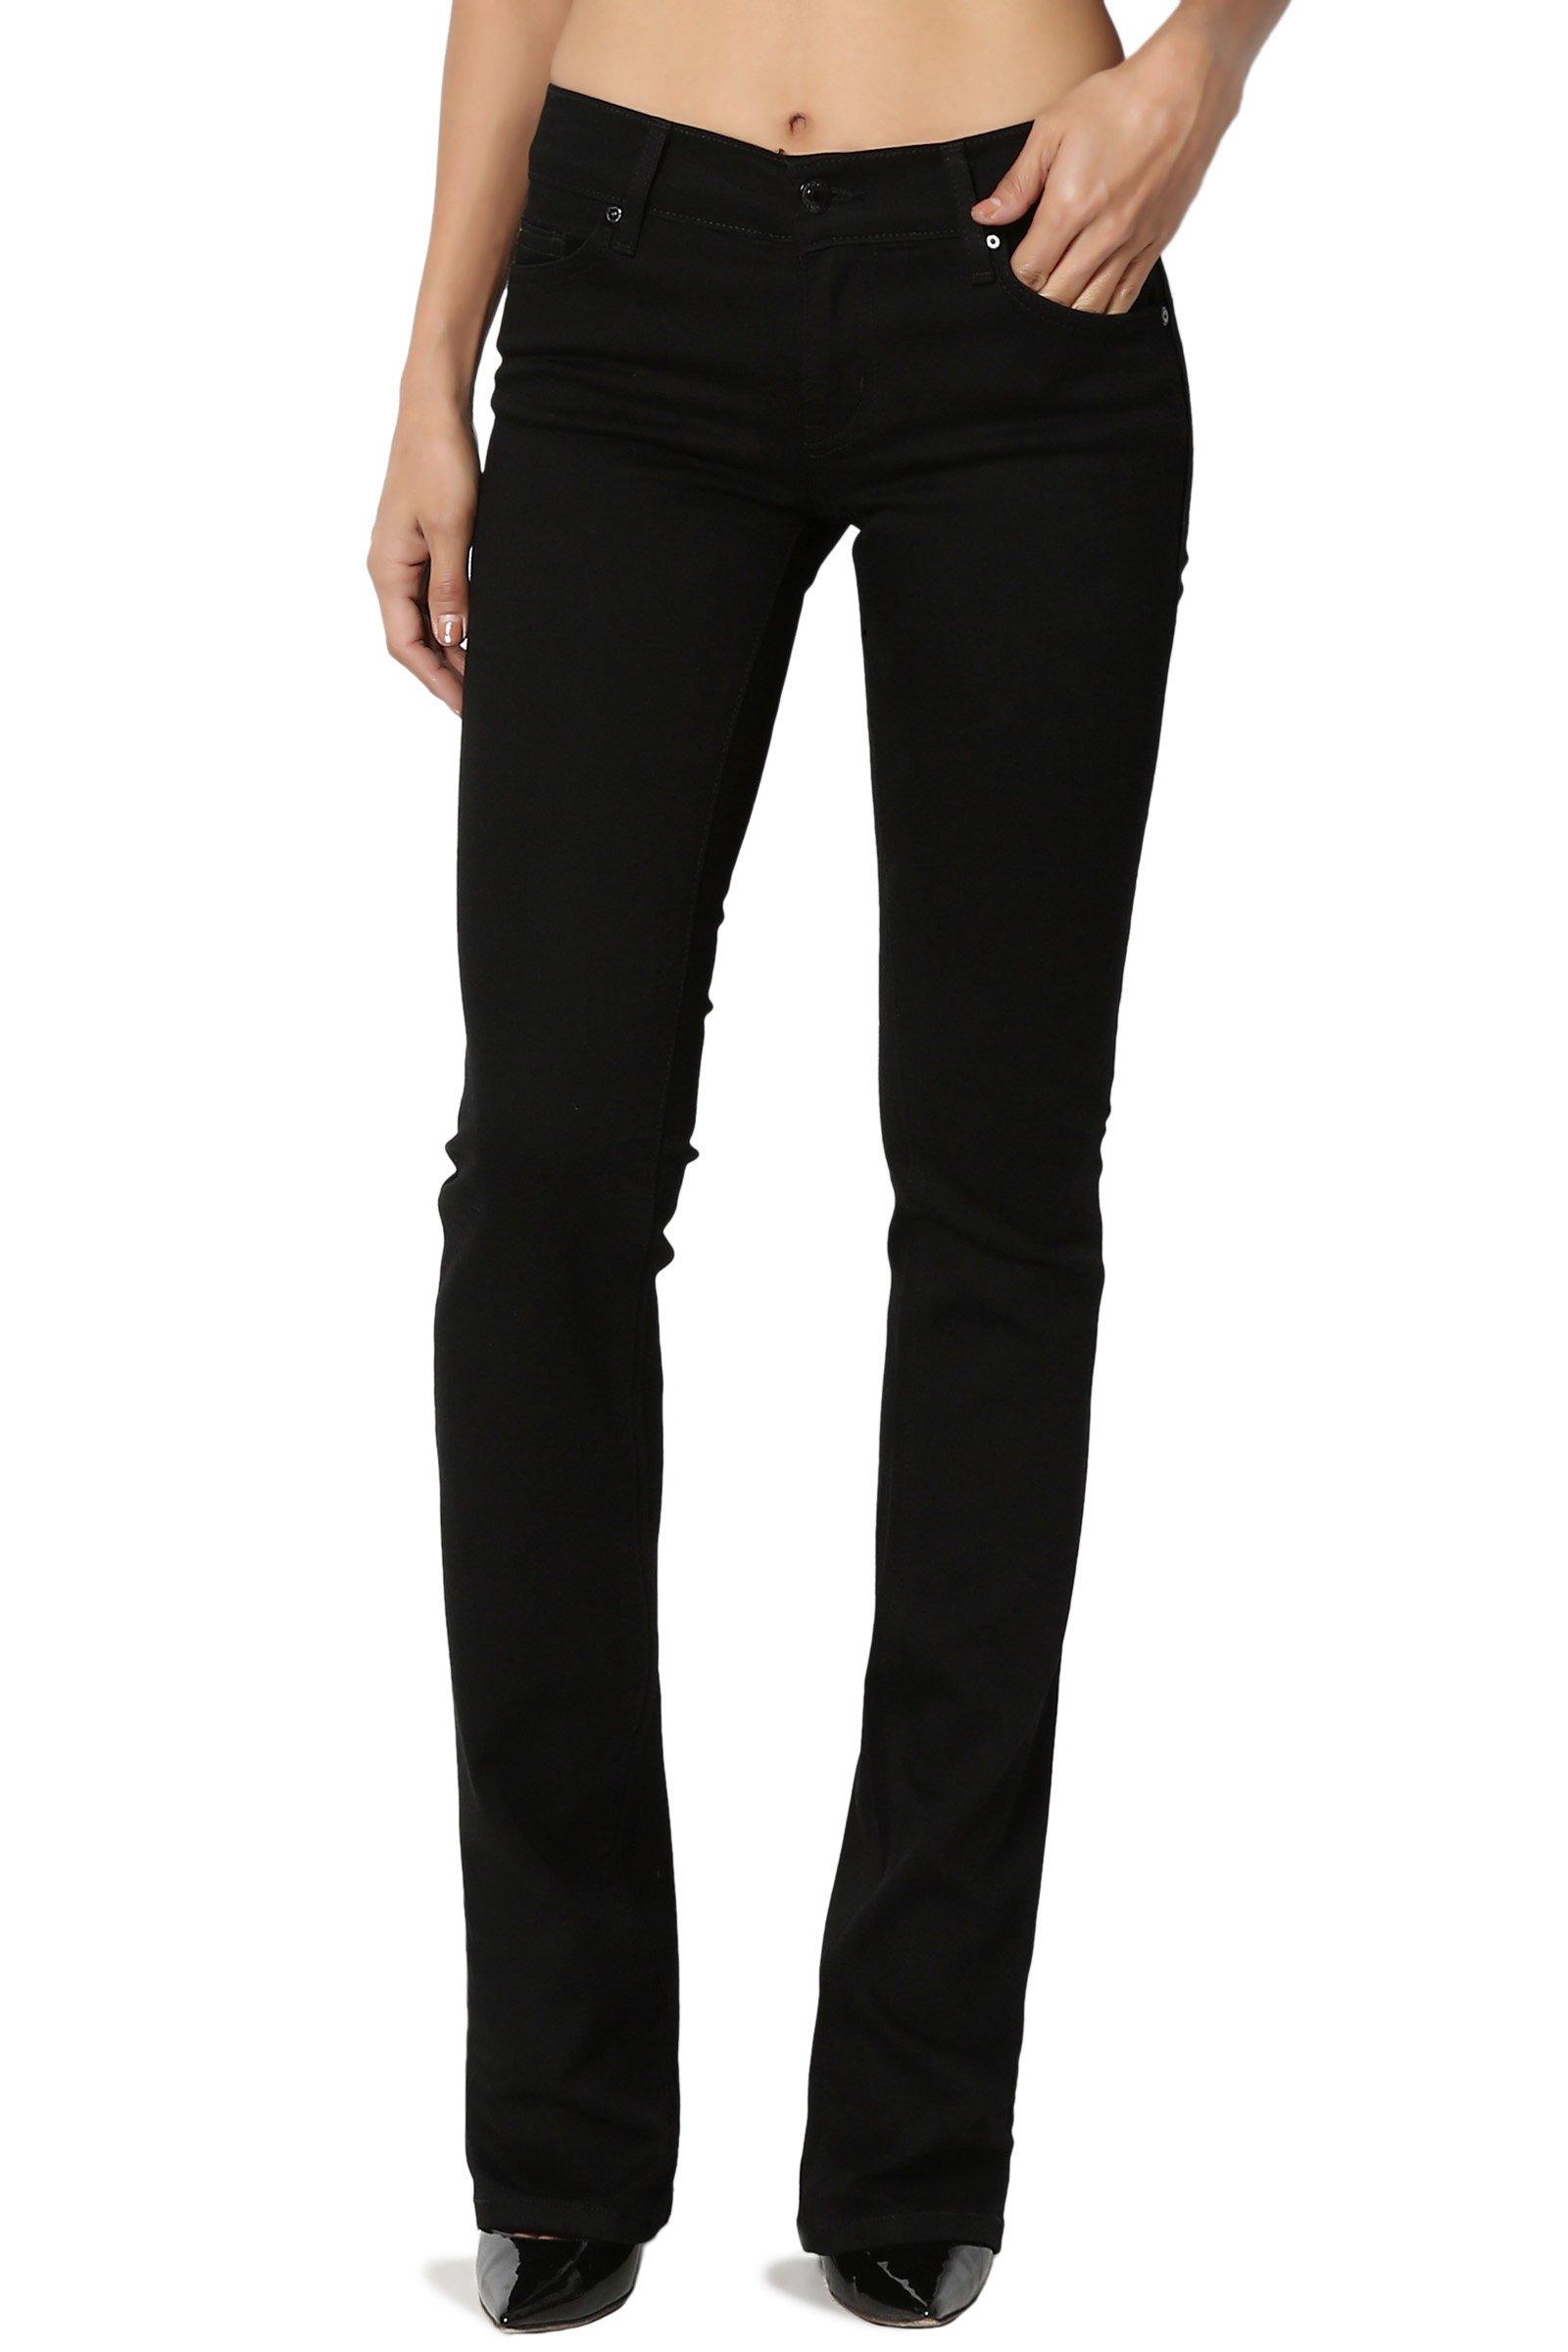 TheMogan Women's Low Rise Stretch Lightweight Slimming Bootcut Jeans Black 11